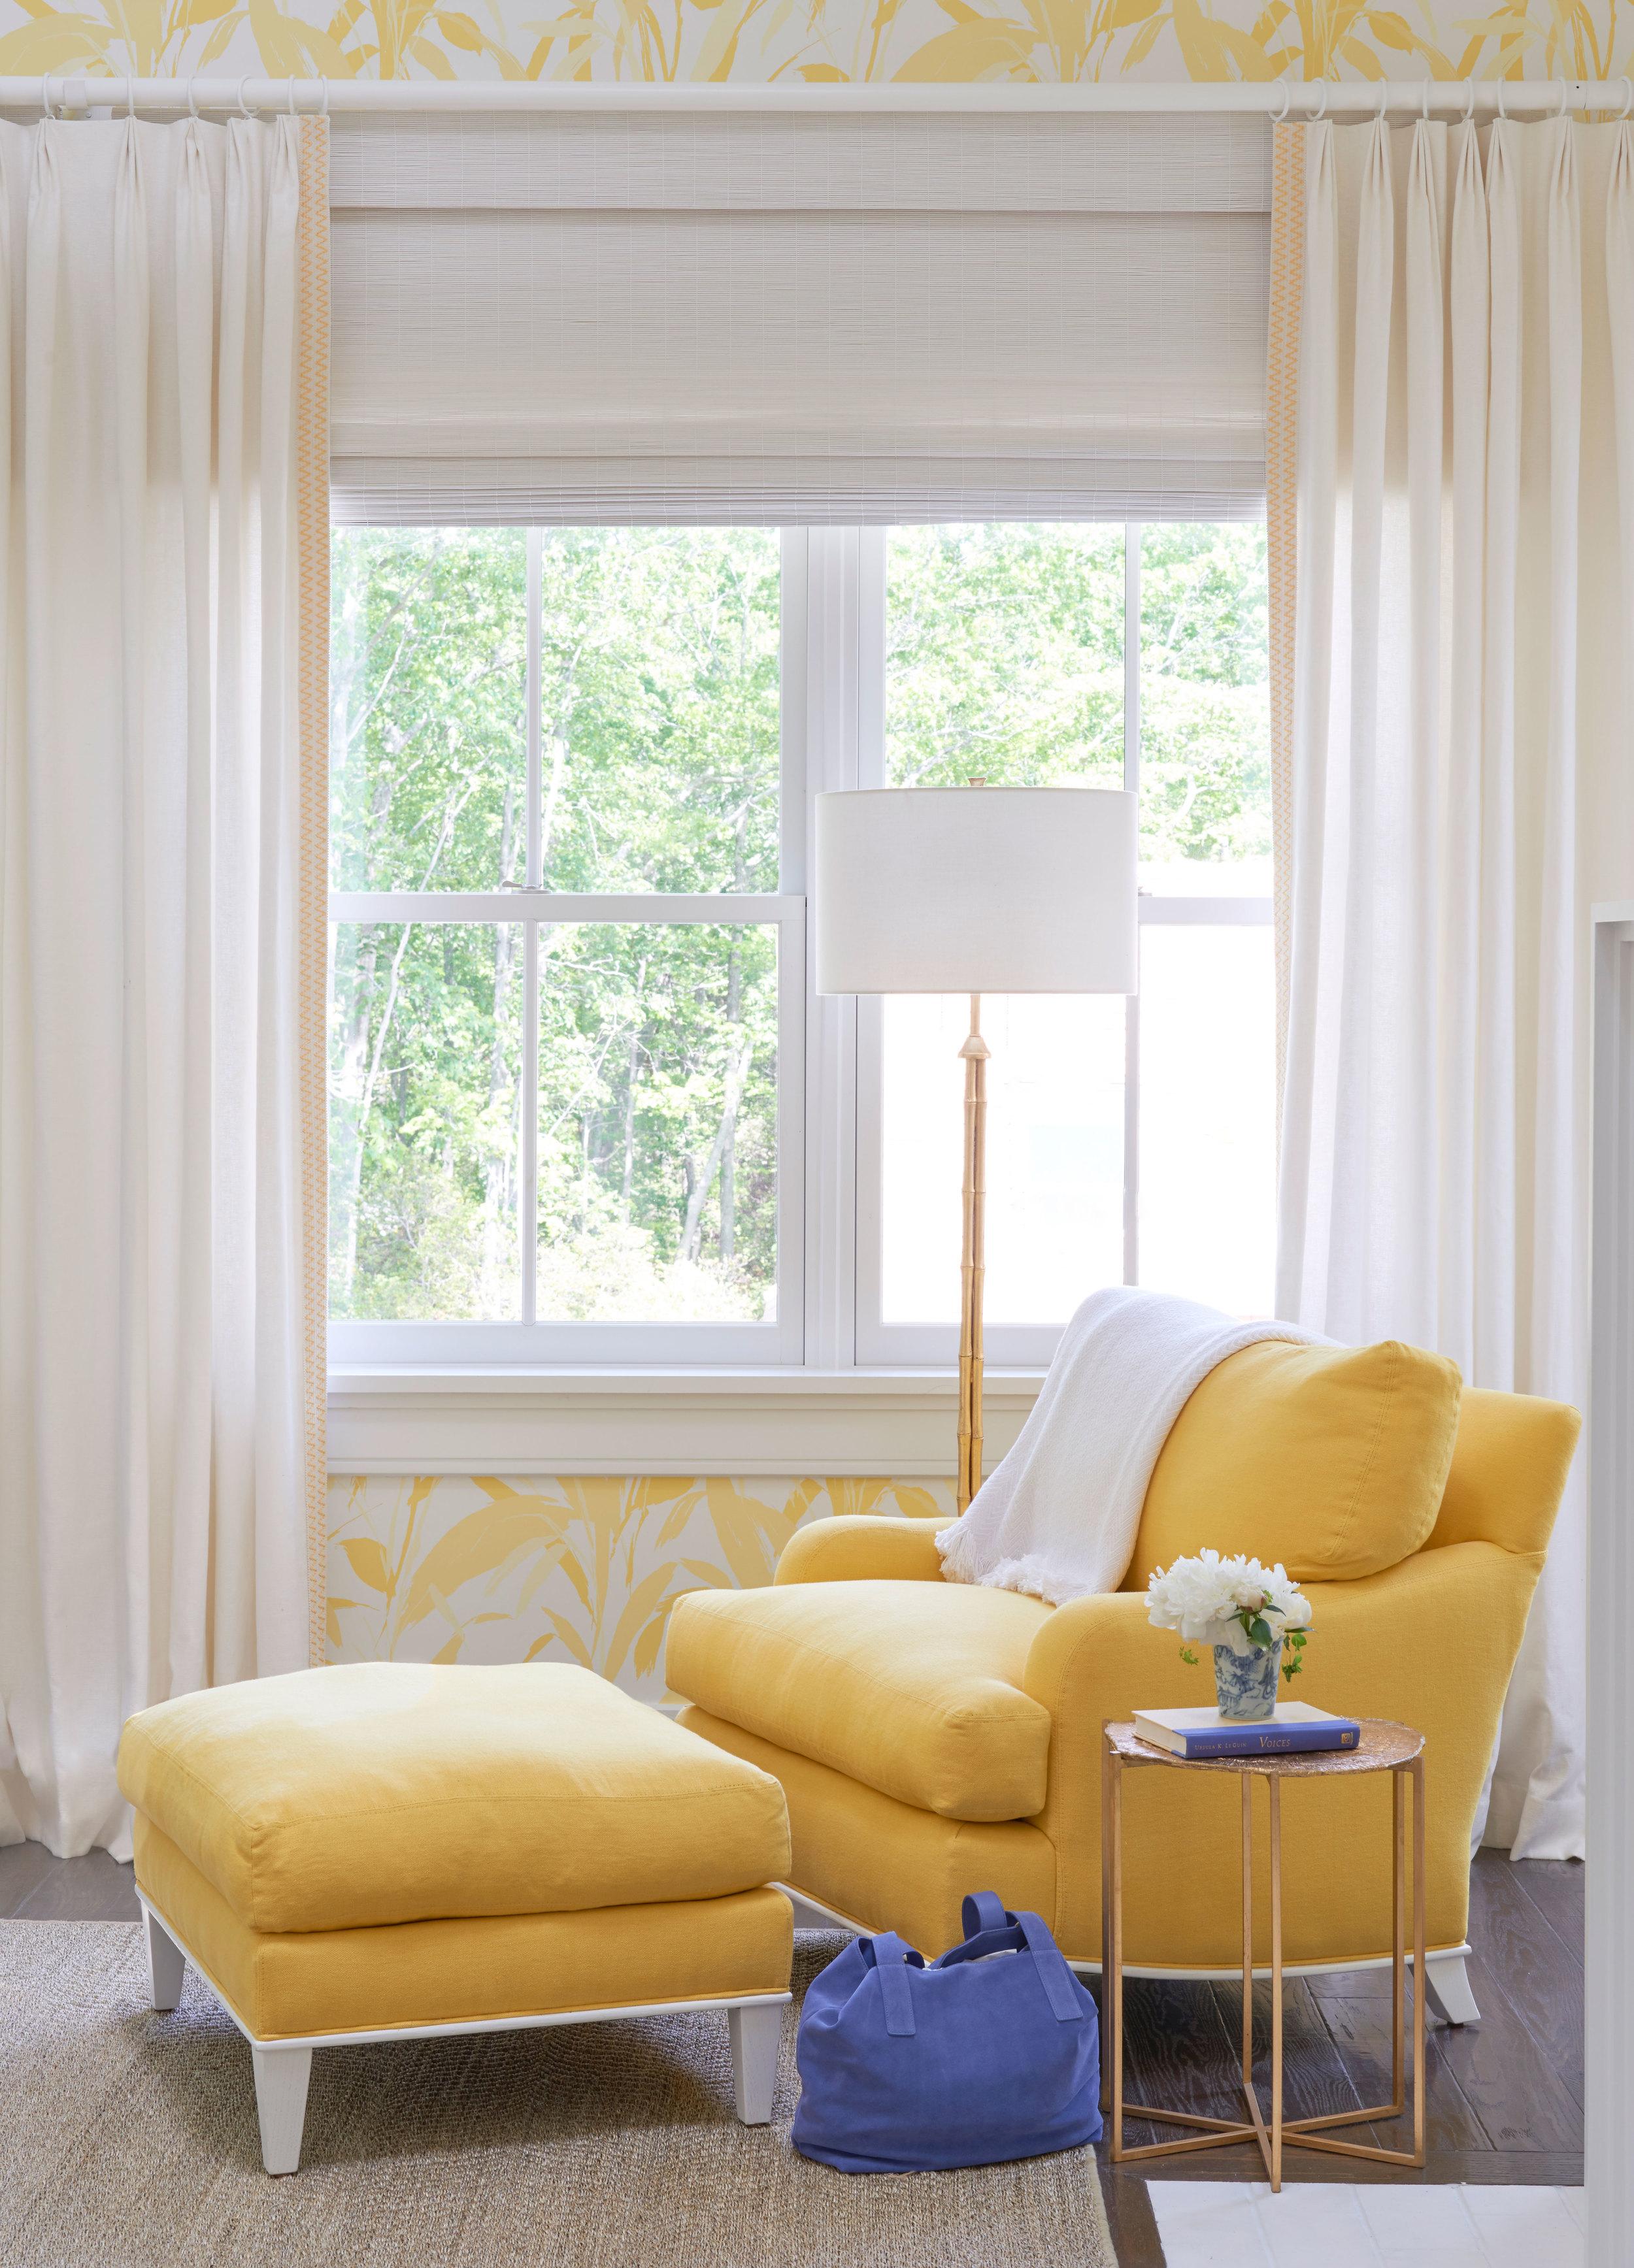 Meg-Braff---Coastal-Living-Coastal-Idea-House-Living-Room-Yellow-Wallpaper.jpg